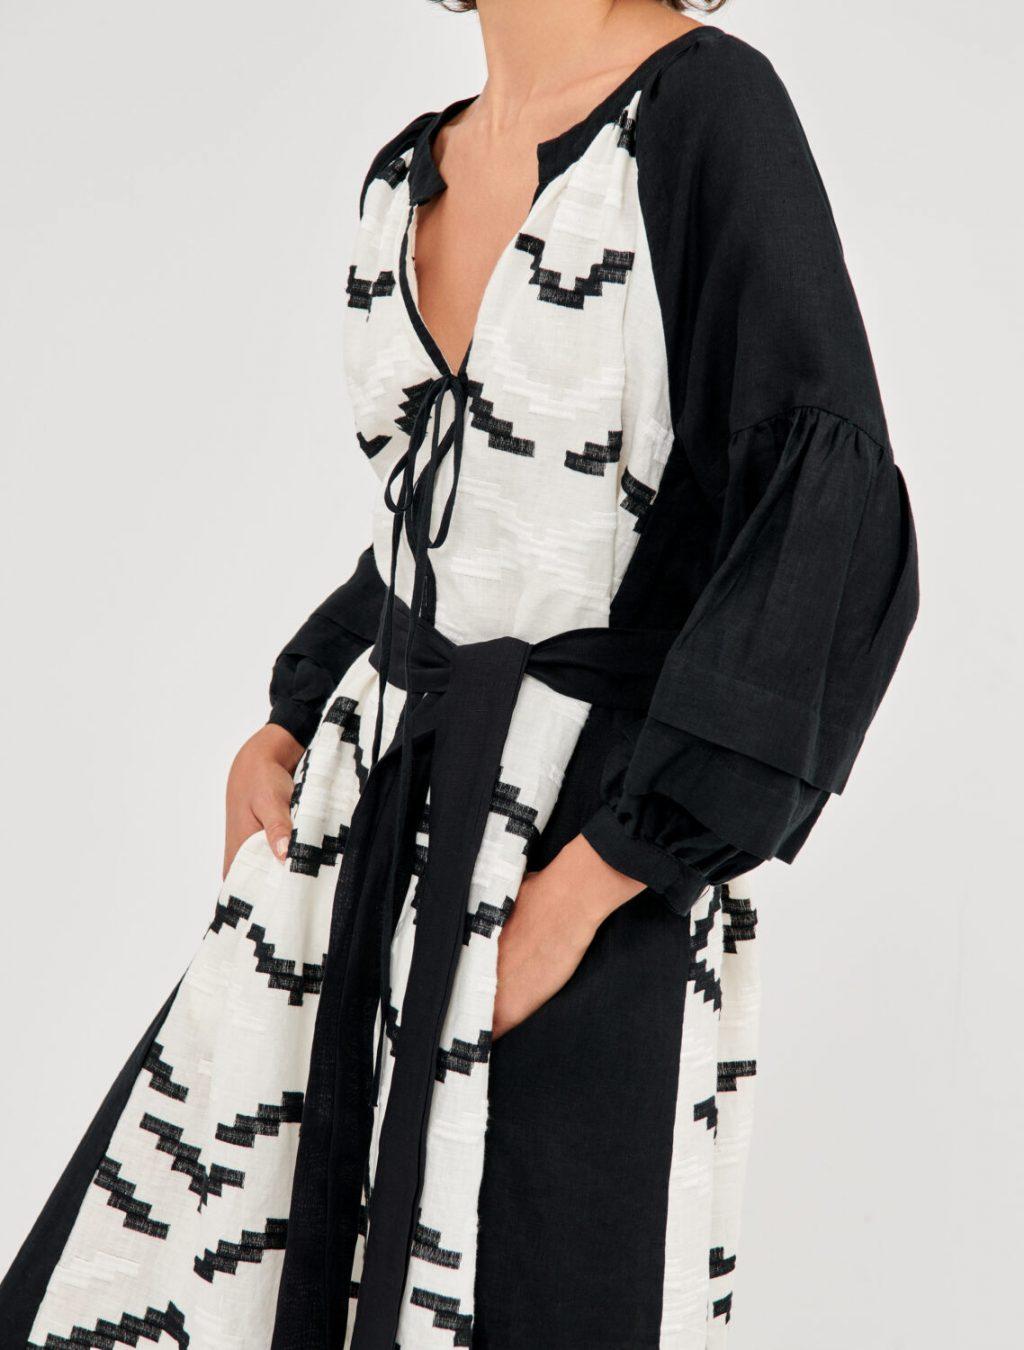 Collection Spring - Summer 2021 GREEK ARCHAIC KORI BOHO EMBROIDERED  MAXI DRESS